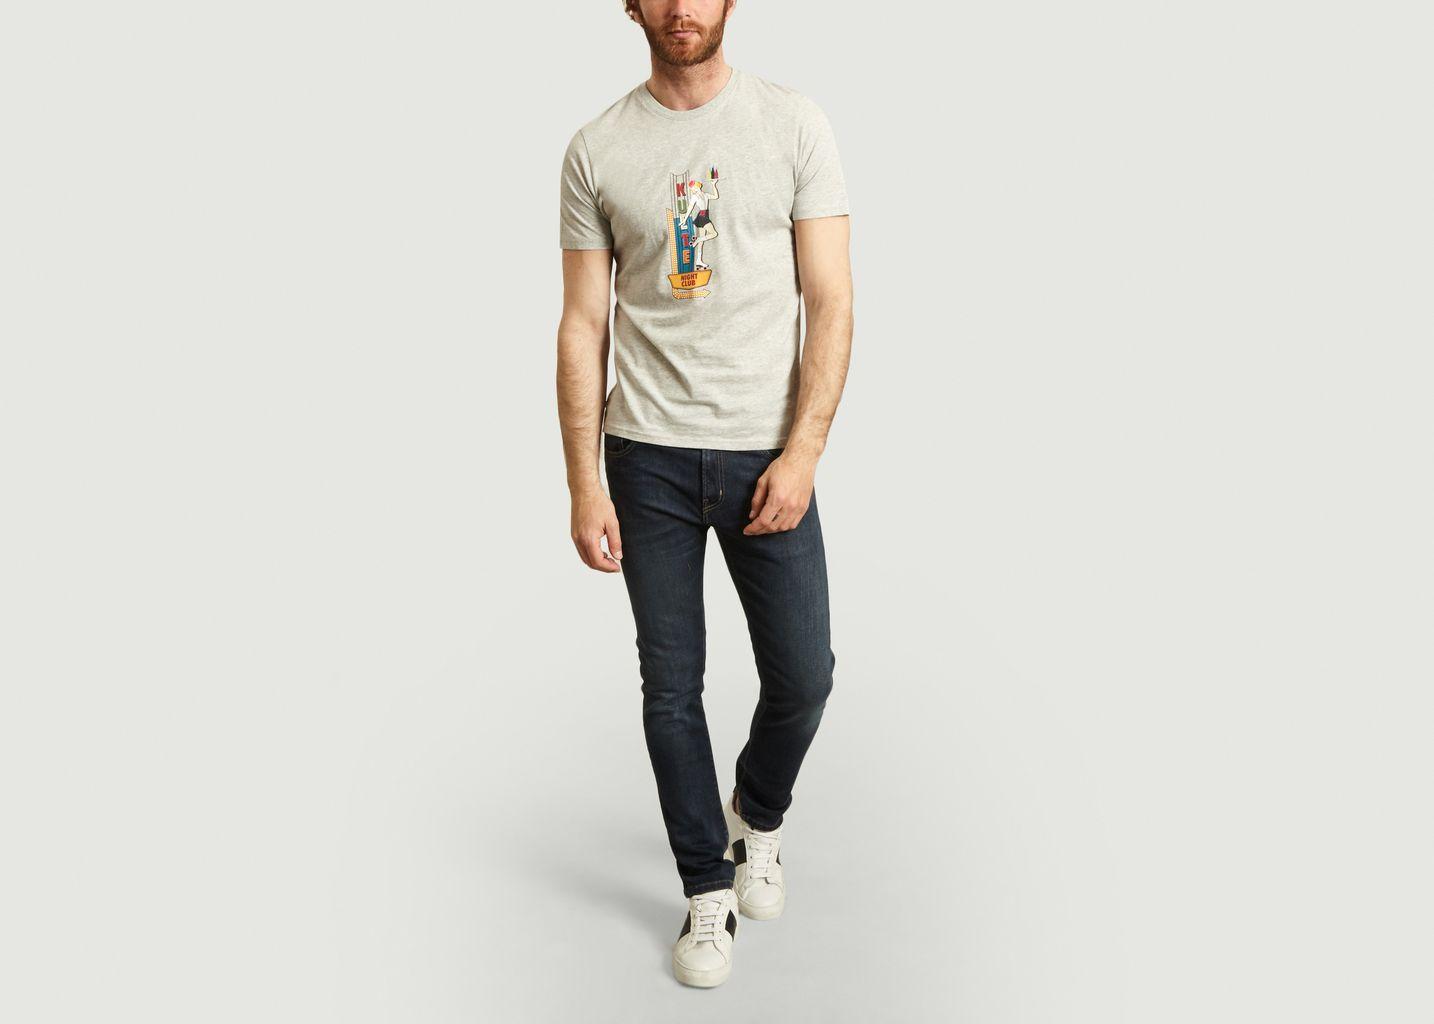 T-shirt Night Klub - Kulte